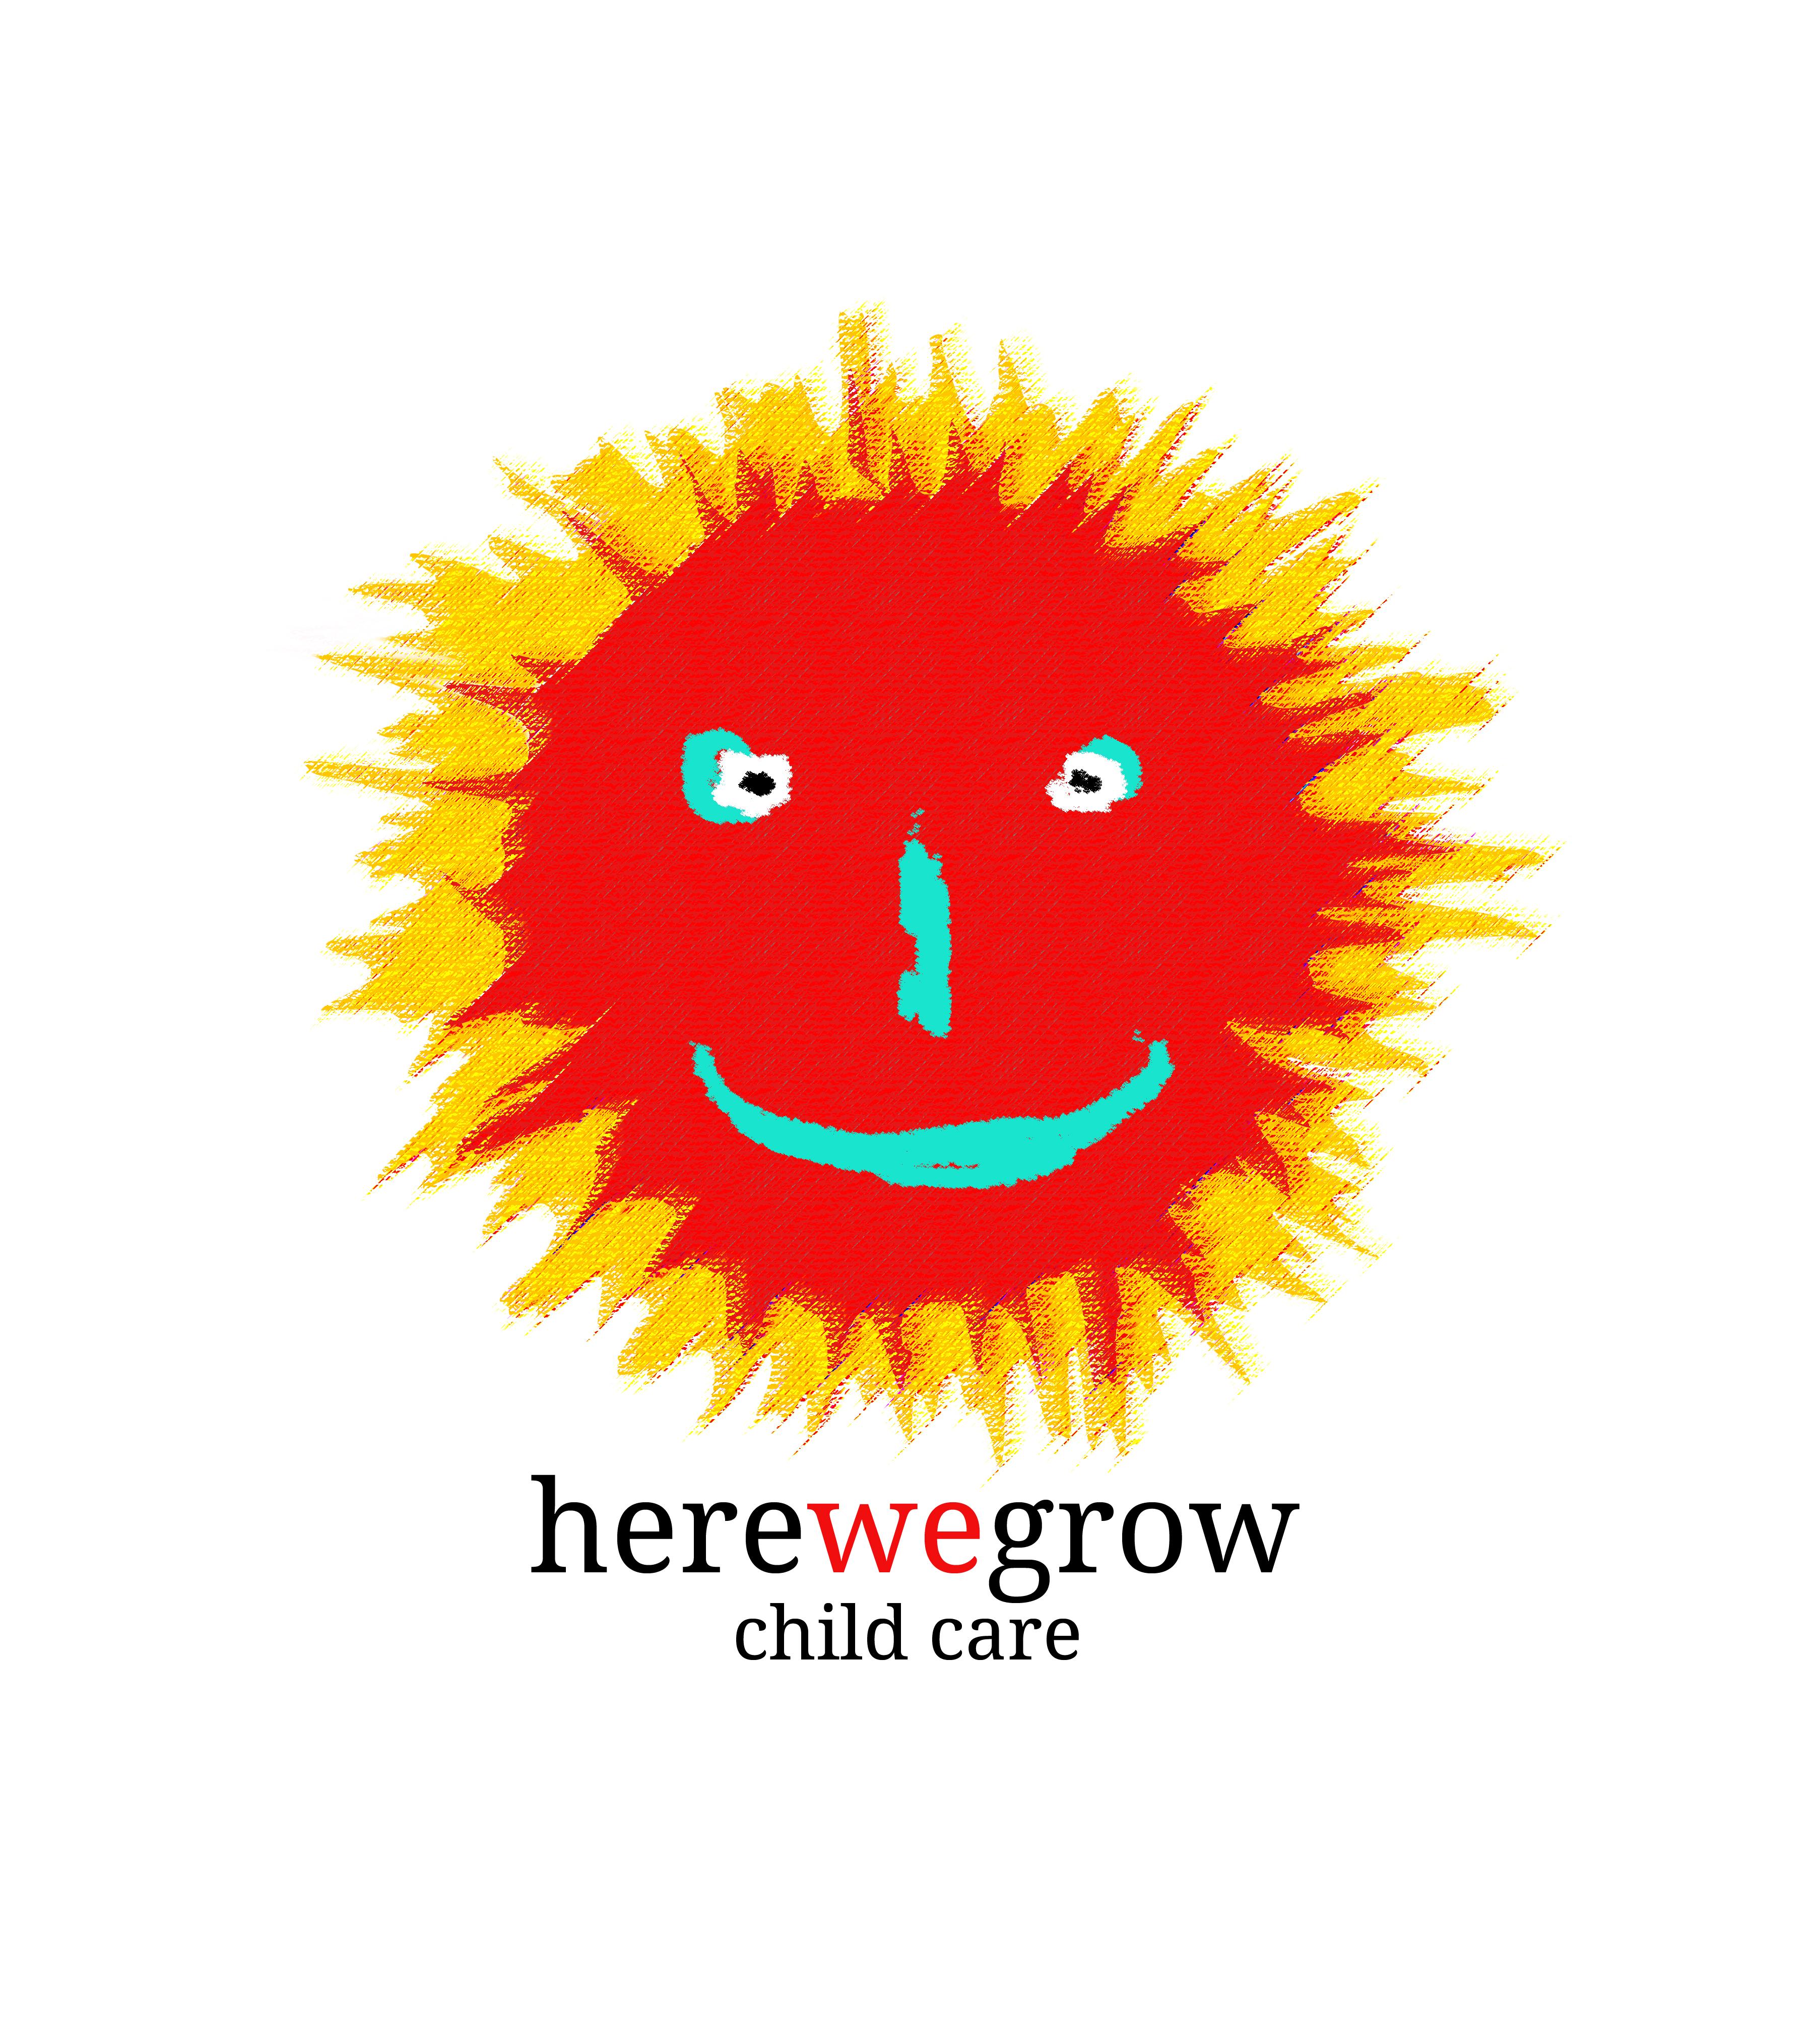 Logo Design by Miroslav Navrátil - Entry No. 114 in the Logo Design Contest Here We Grow Logo Design.